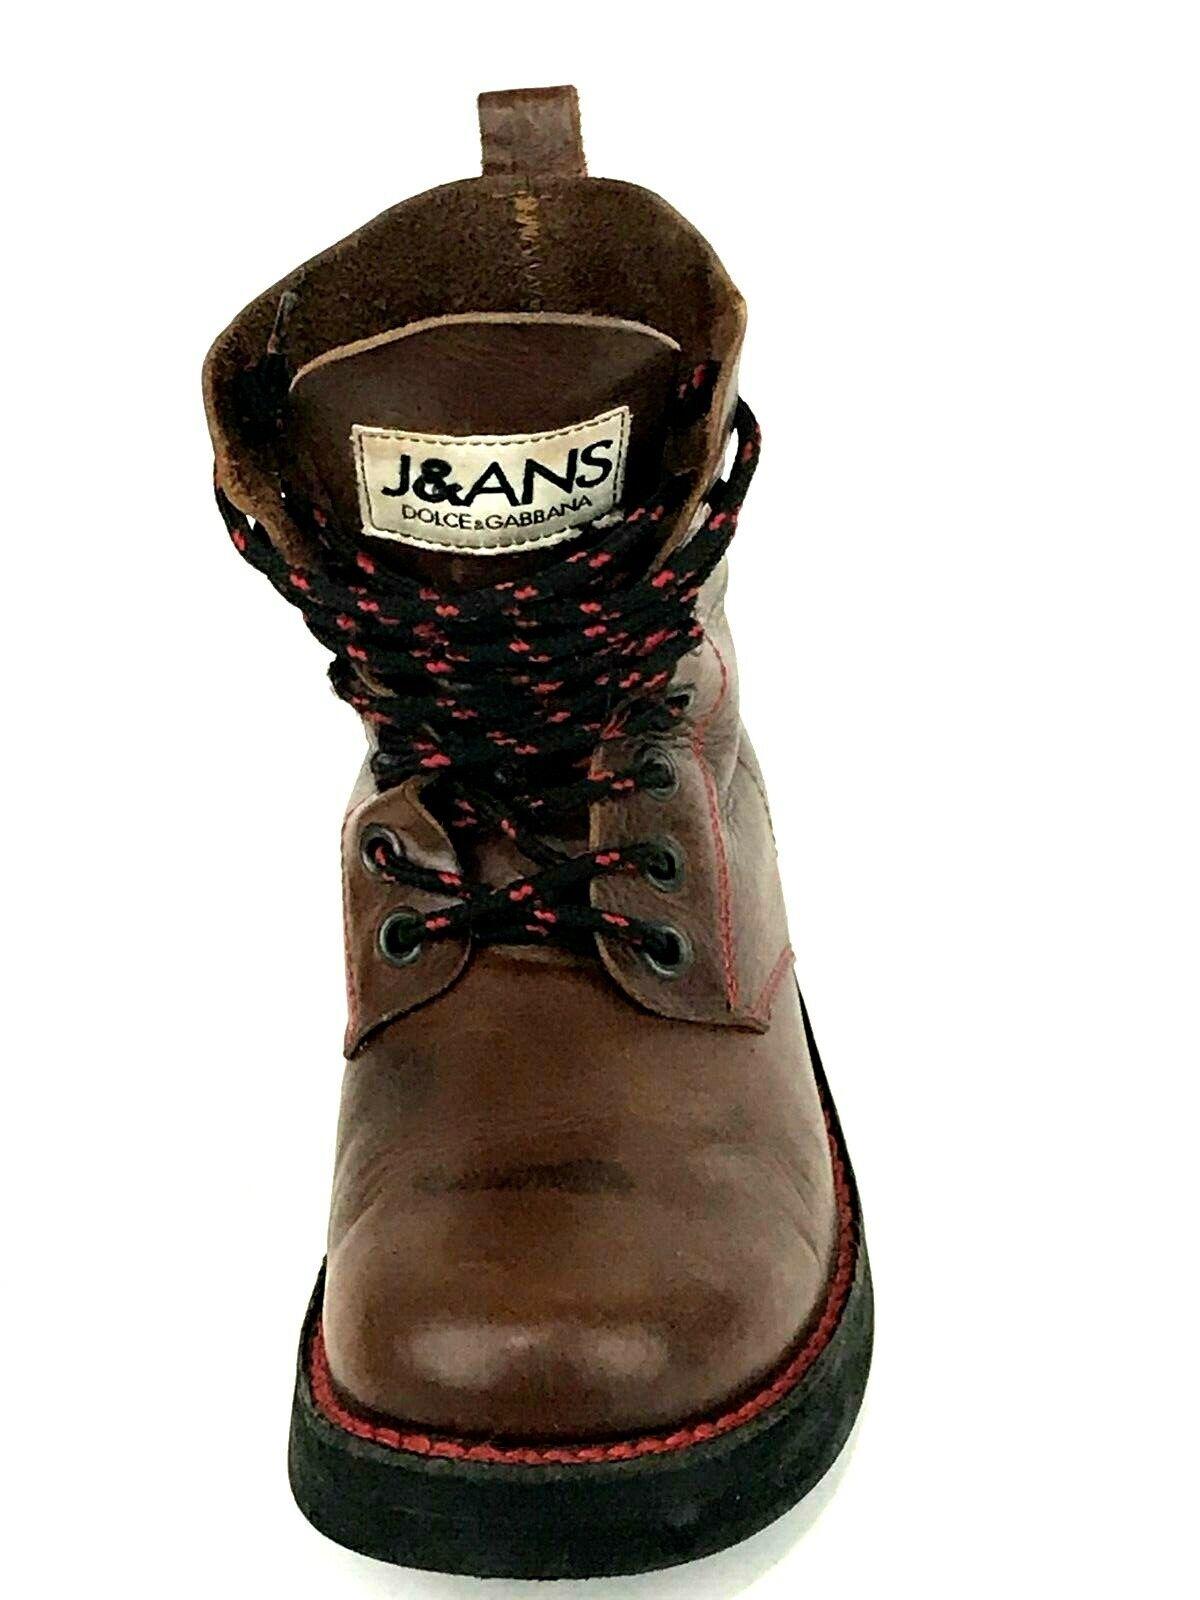 Dolce & Gabbana J&ANS Men's Ankle Boots Size UK.8.5 US. 9 EU. 42